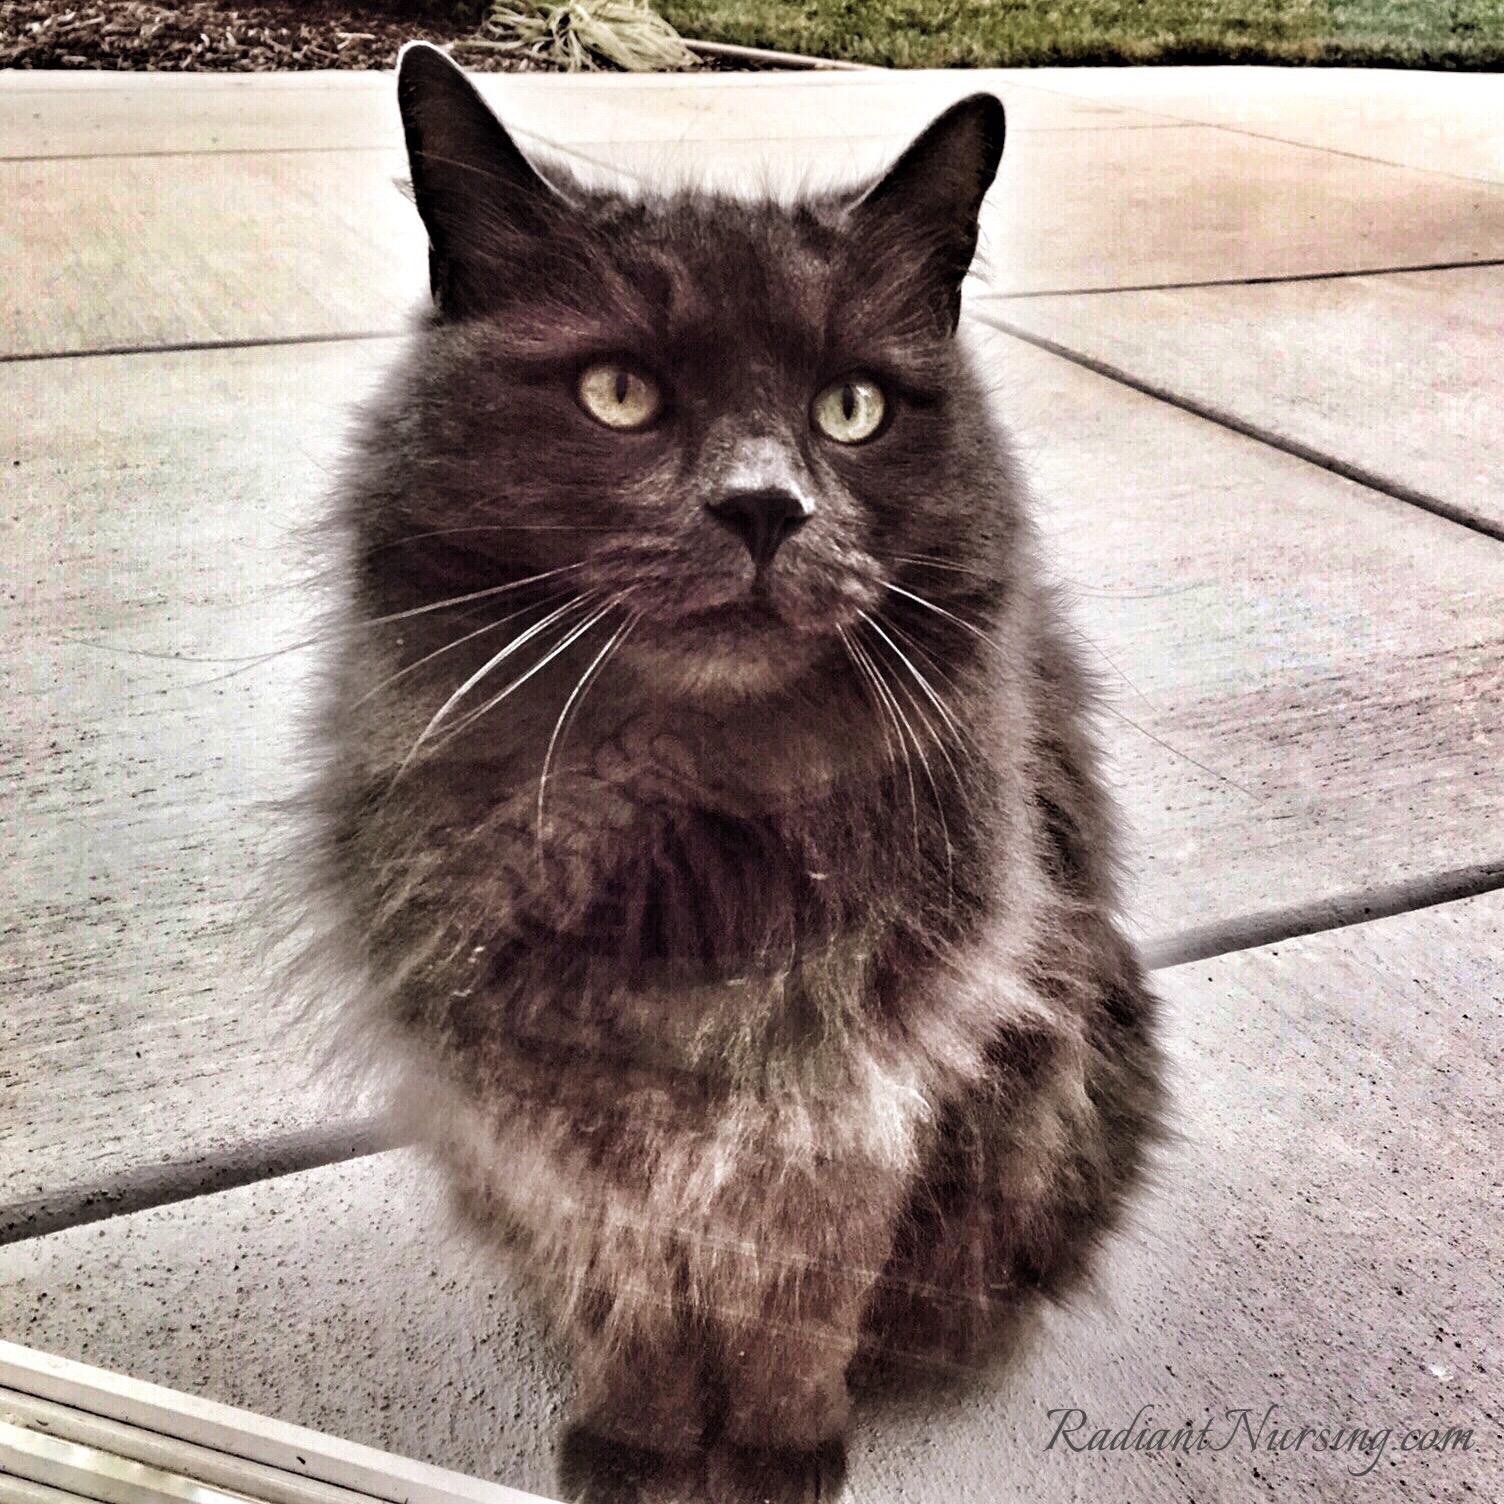 The neighbor kitty saying hello outside the sliding glass door.